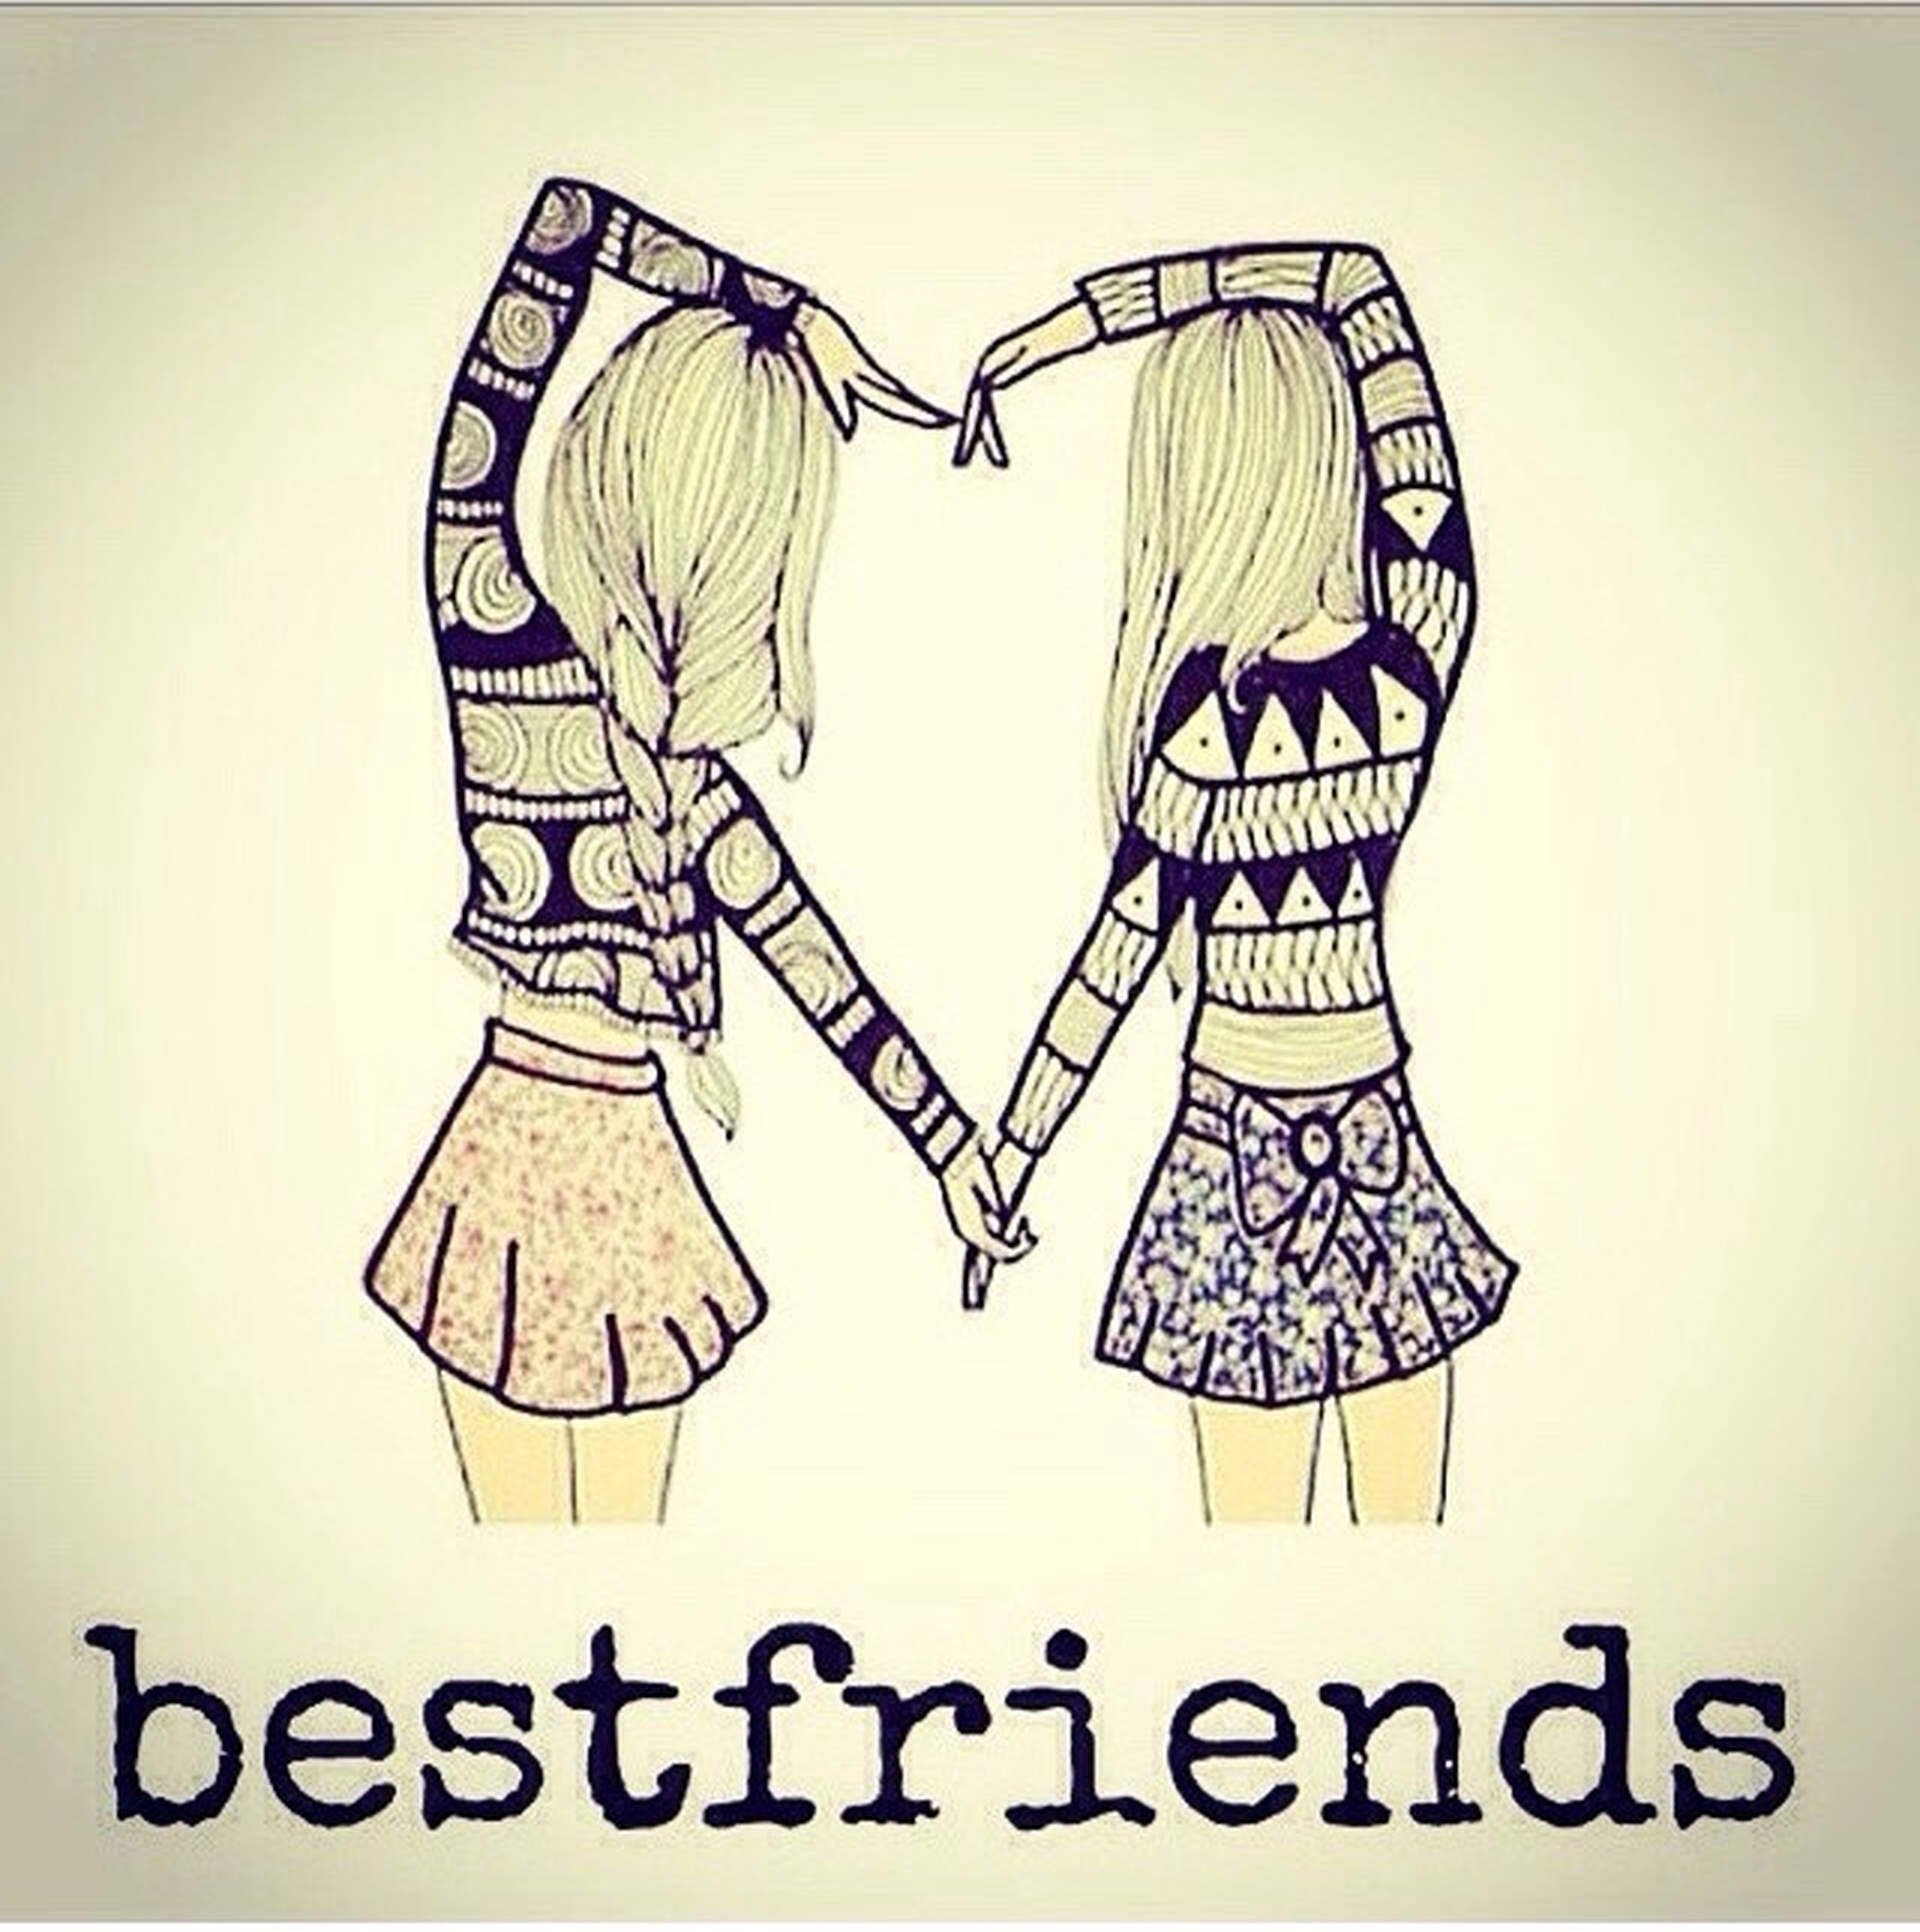 Best friends love